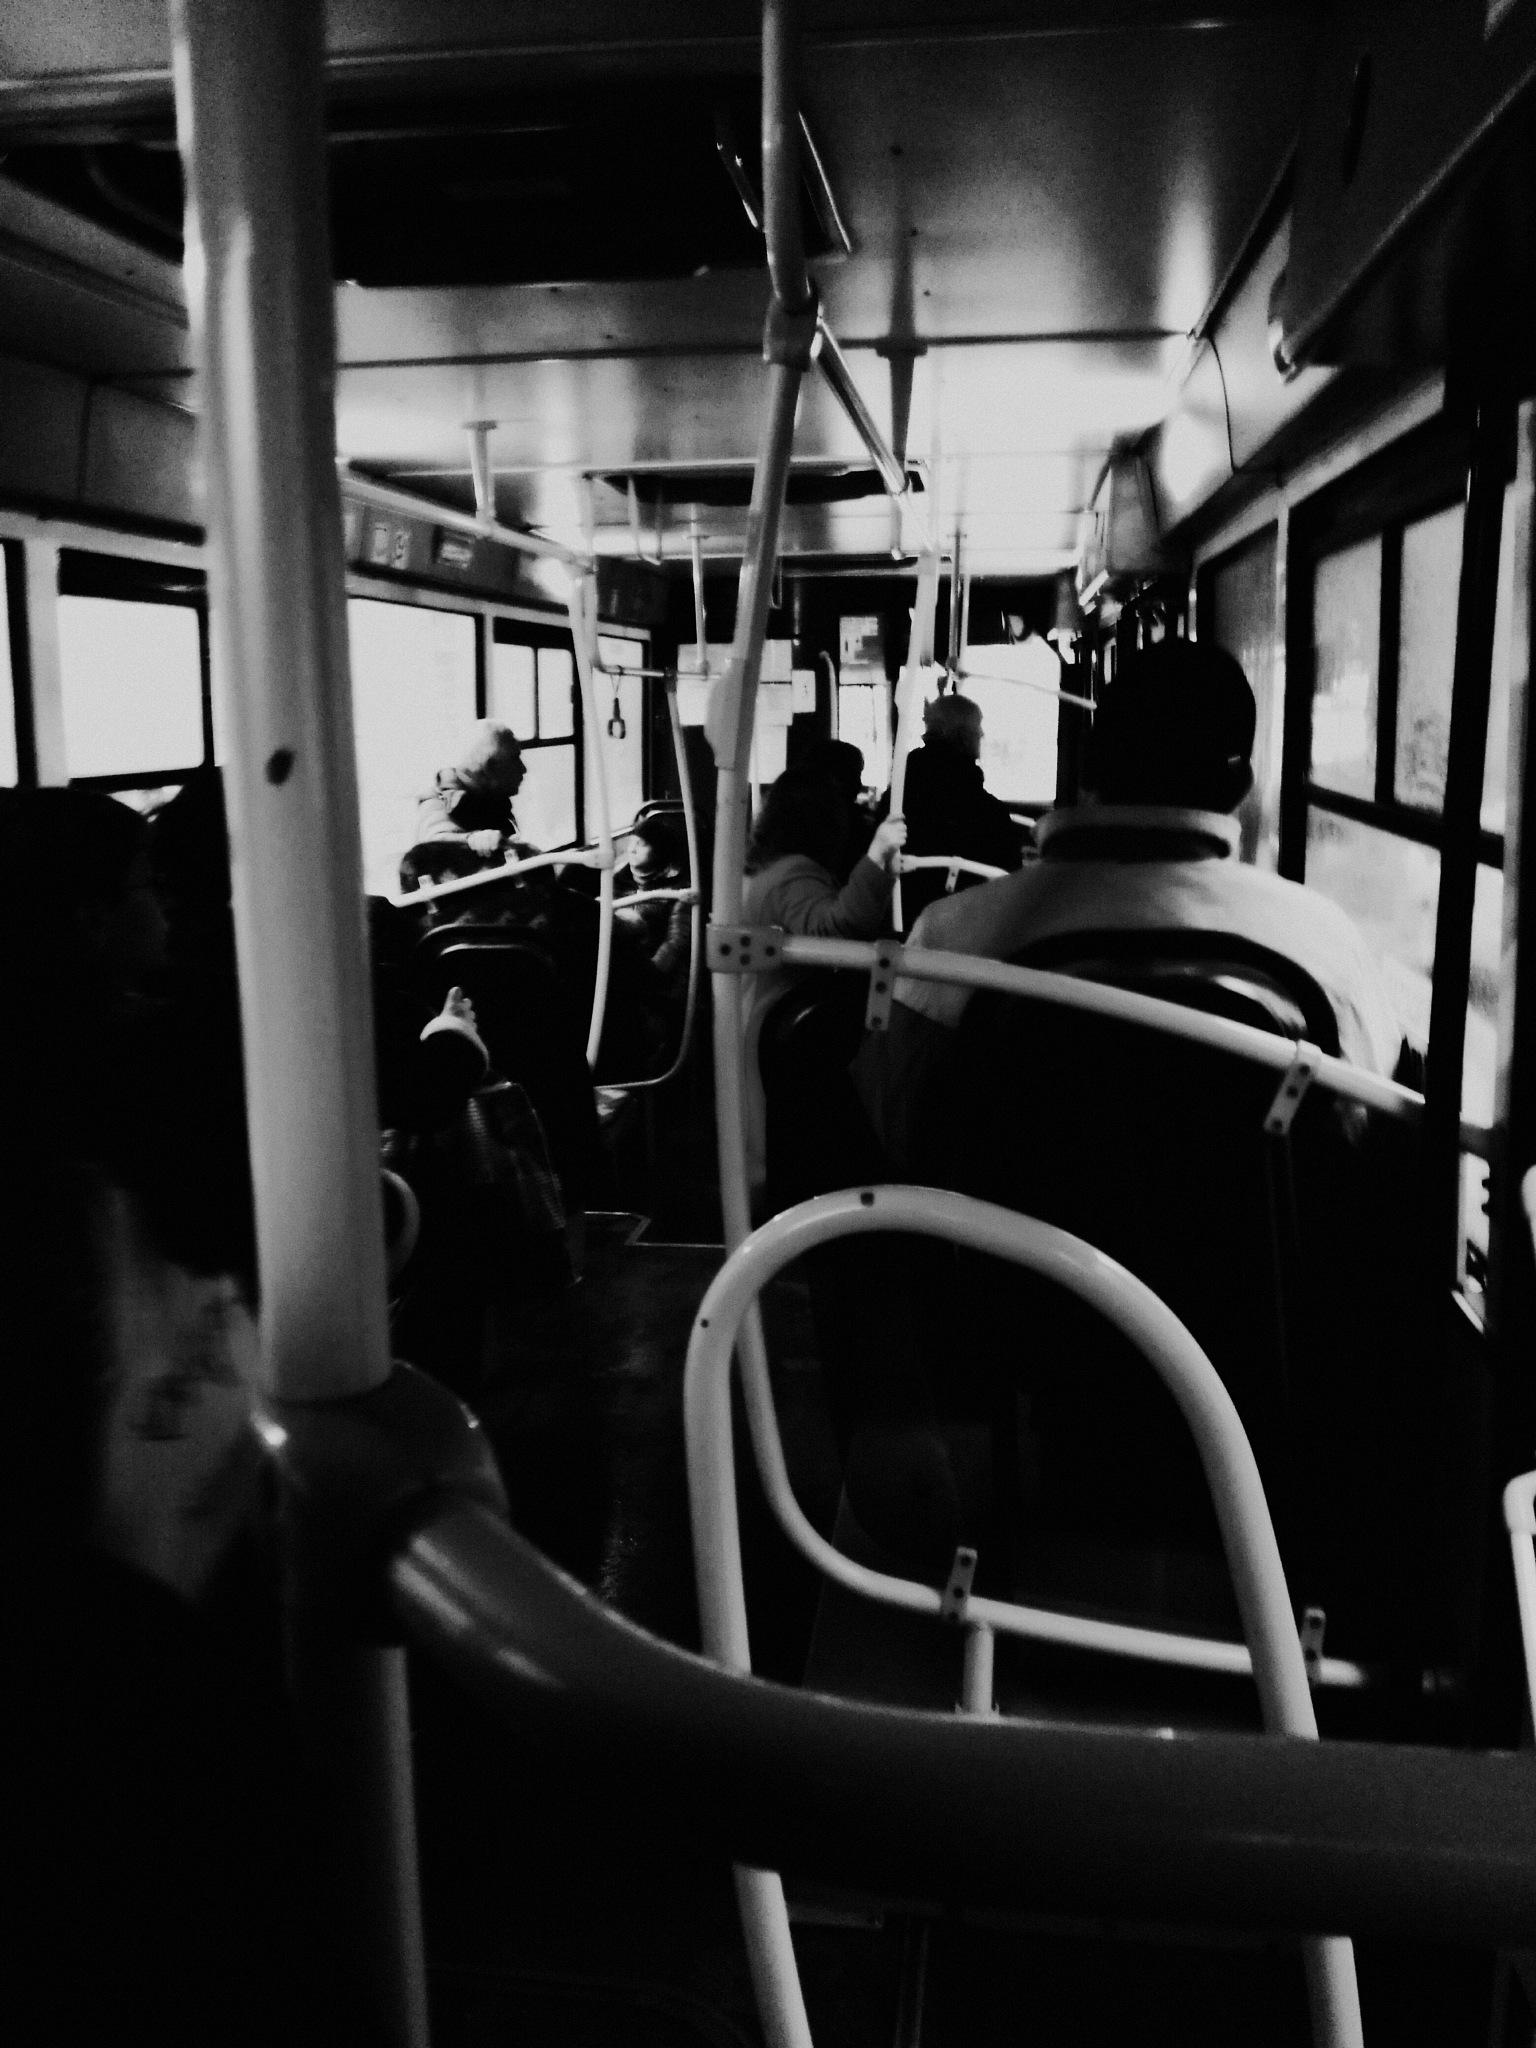 Commuting by AP